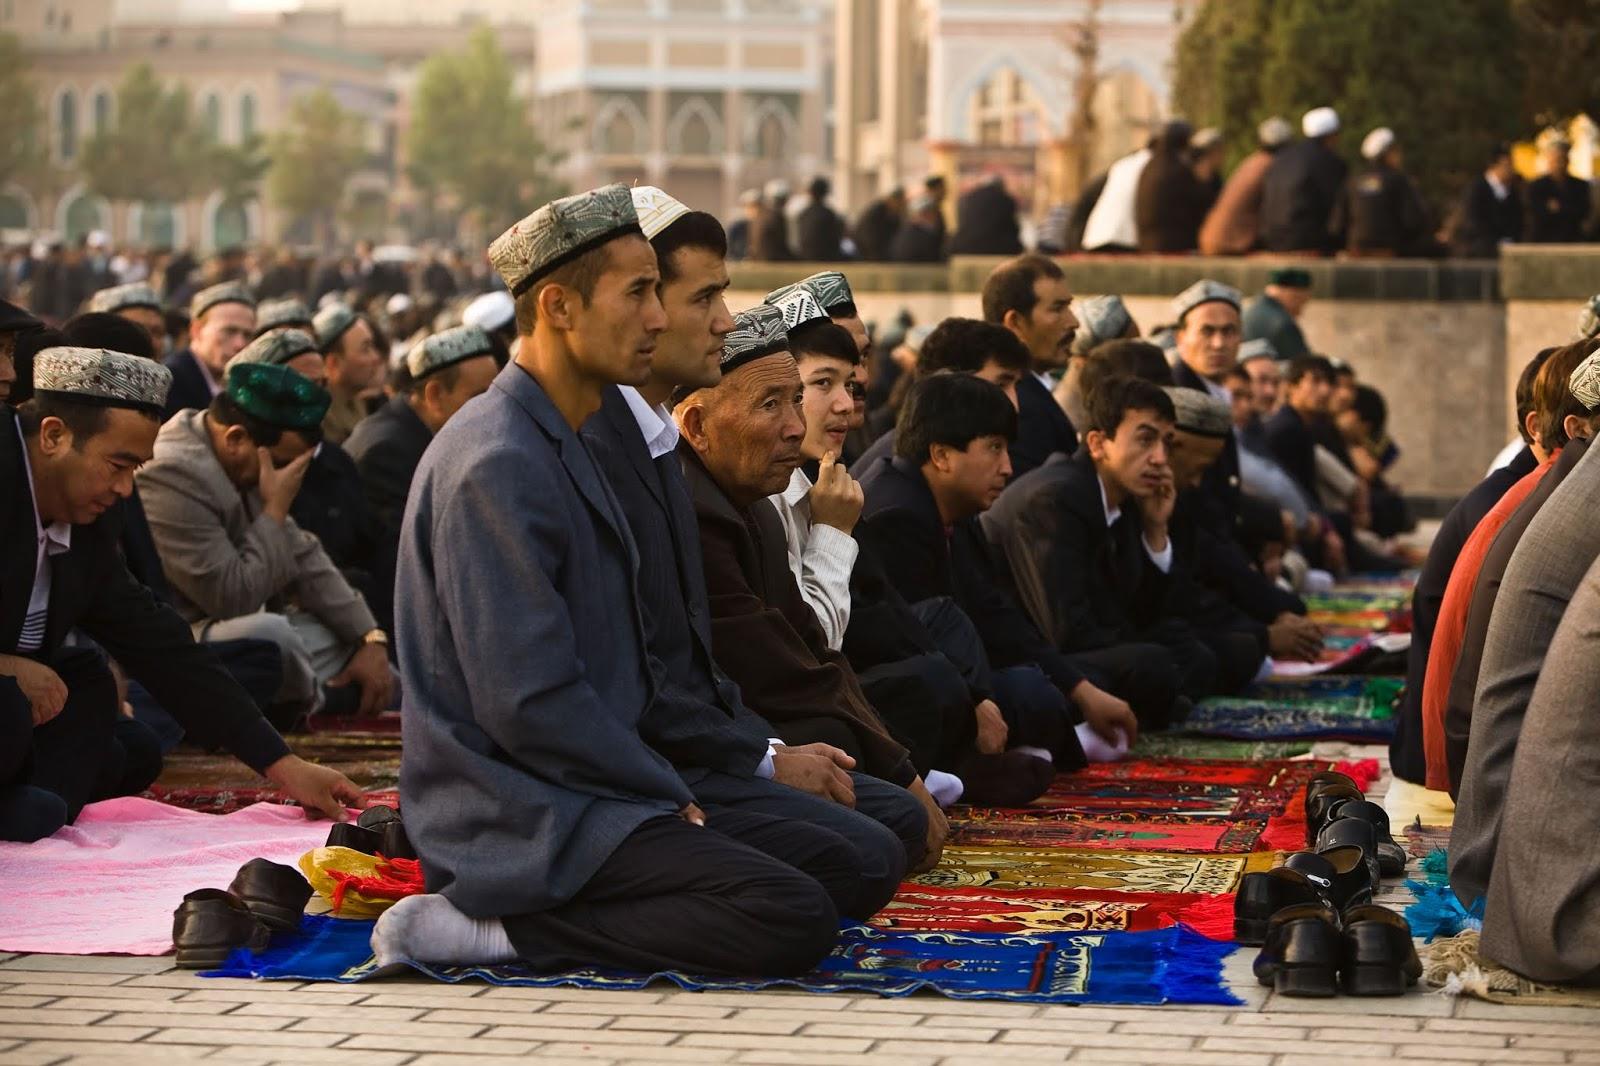 Terungkap, Fakta Baru Kamp Penahanan Muslim Uighur yang Mengenaskan